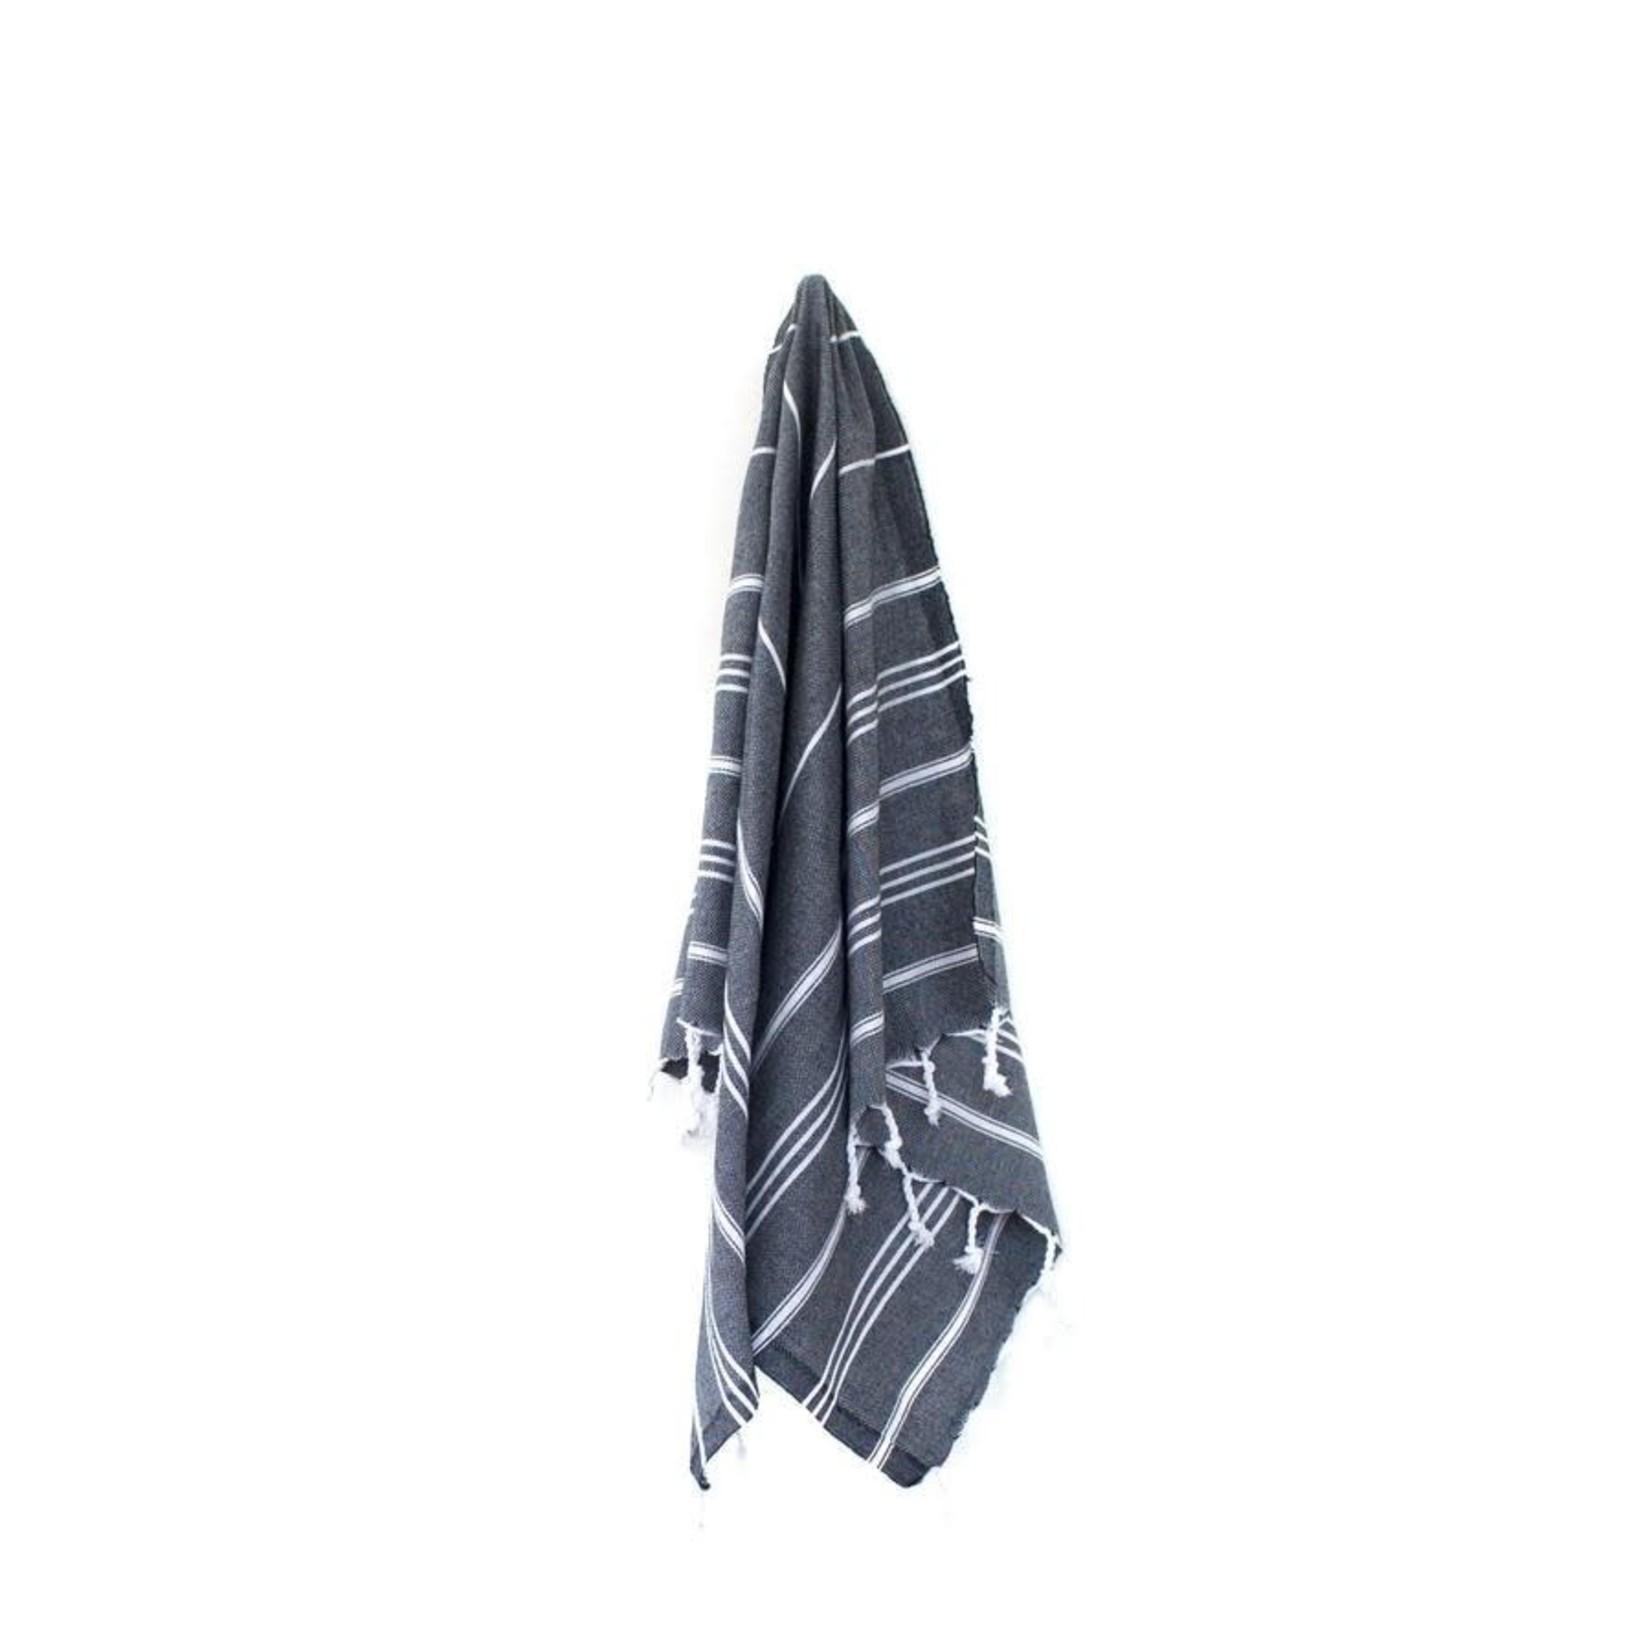 MARIN SMALL TOWEL - BLACK